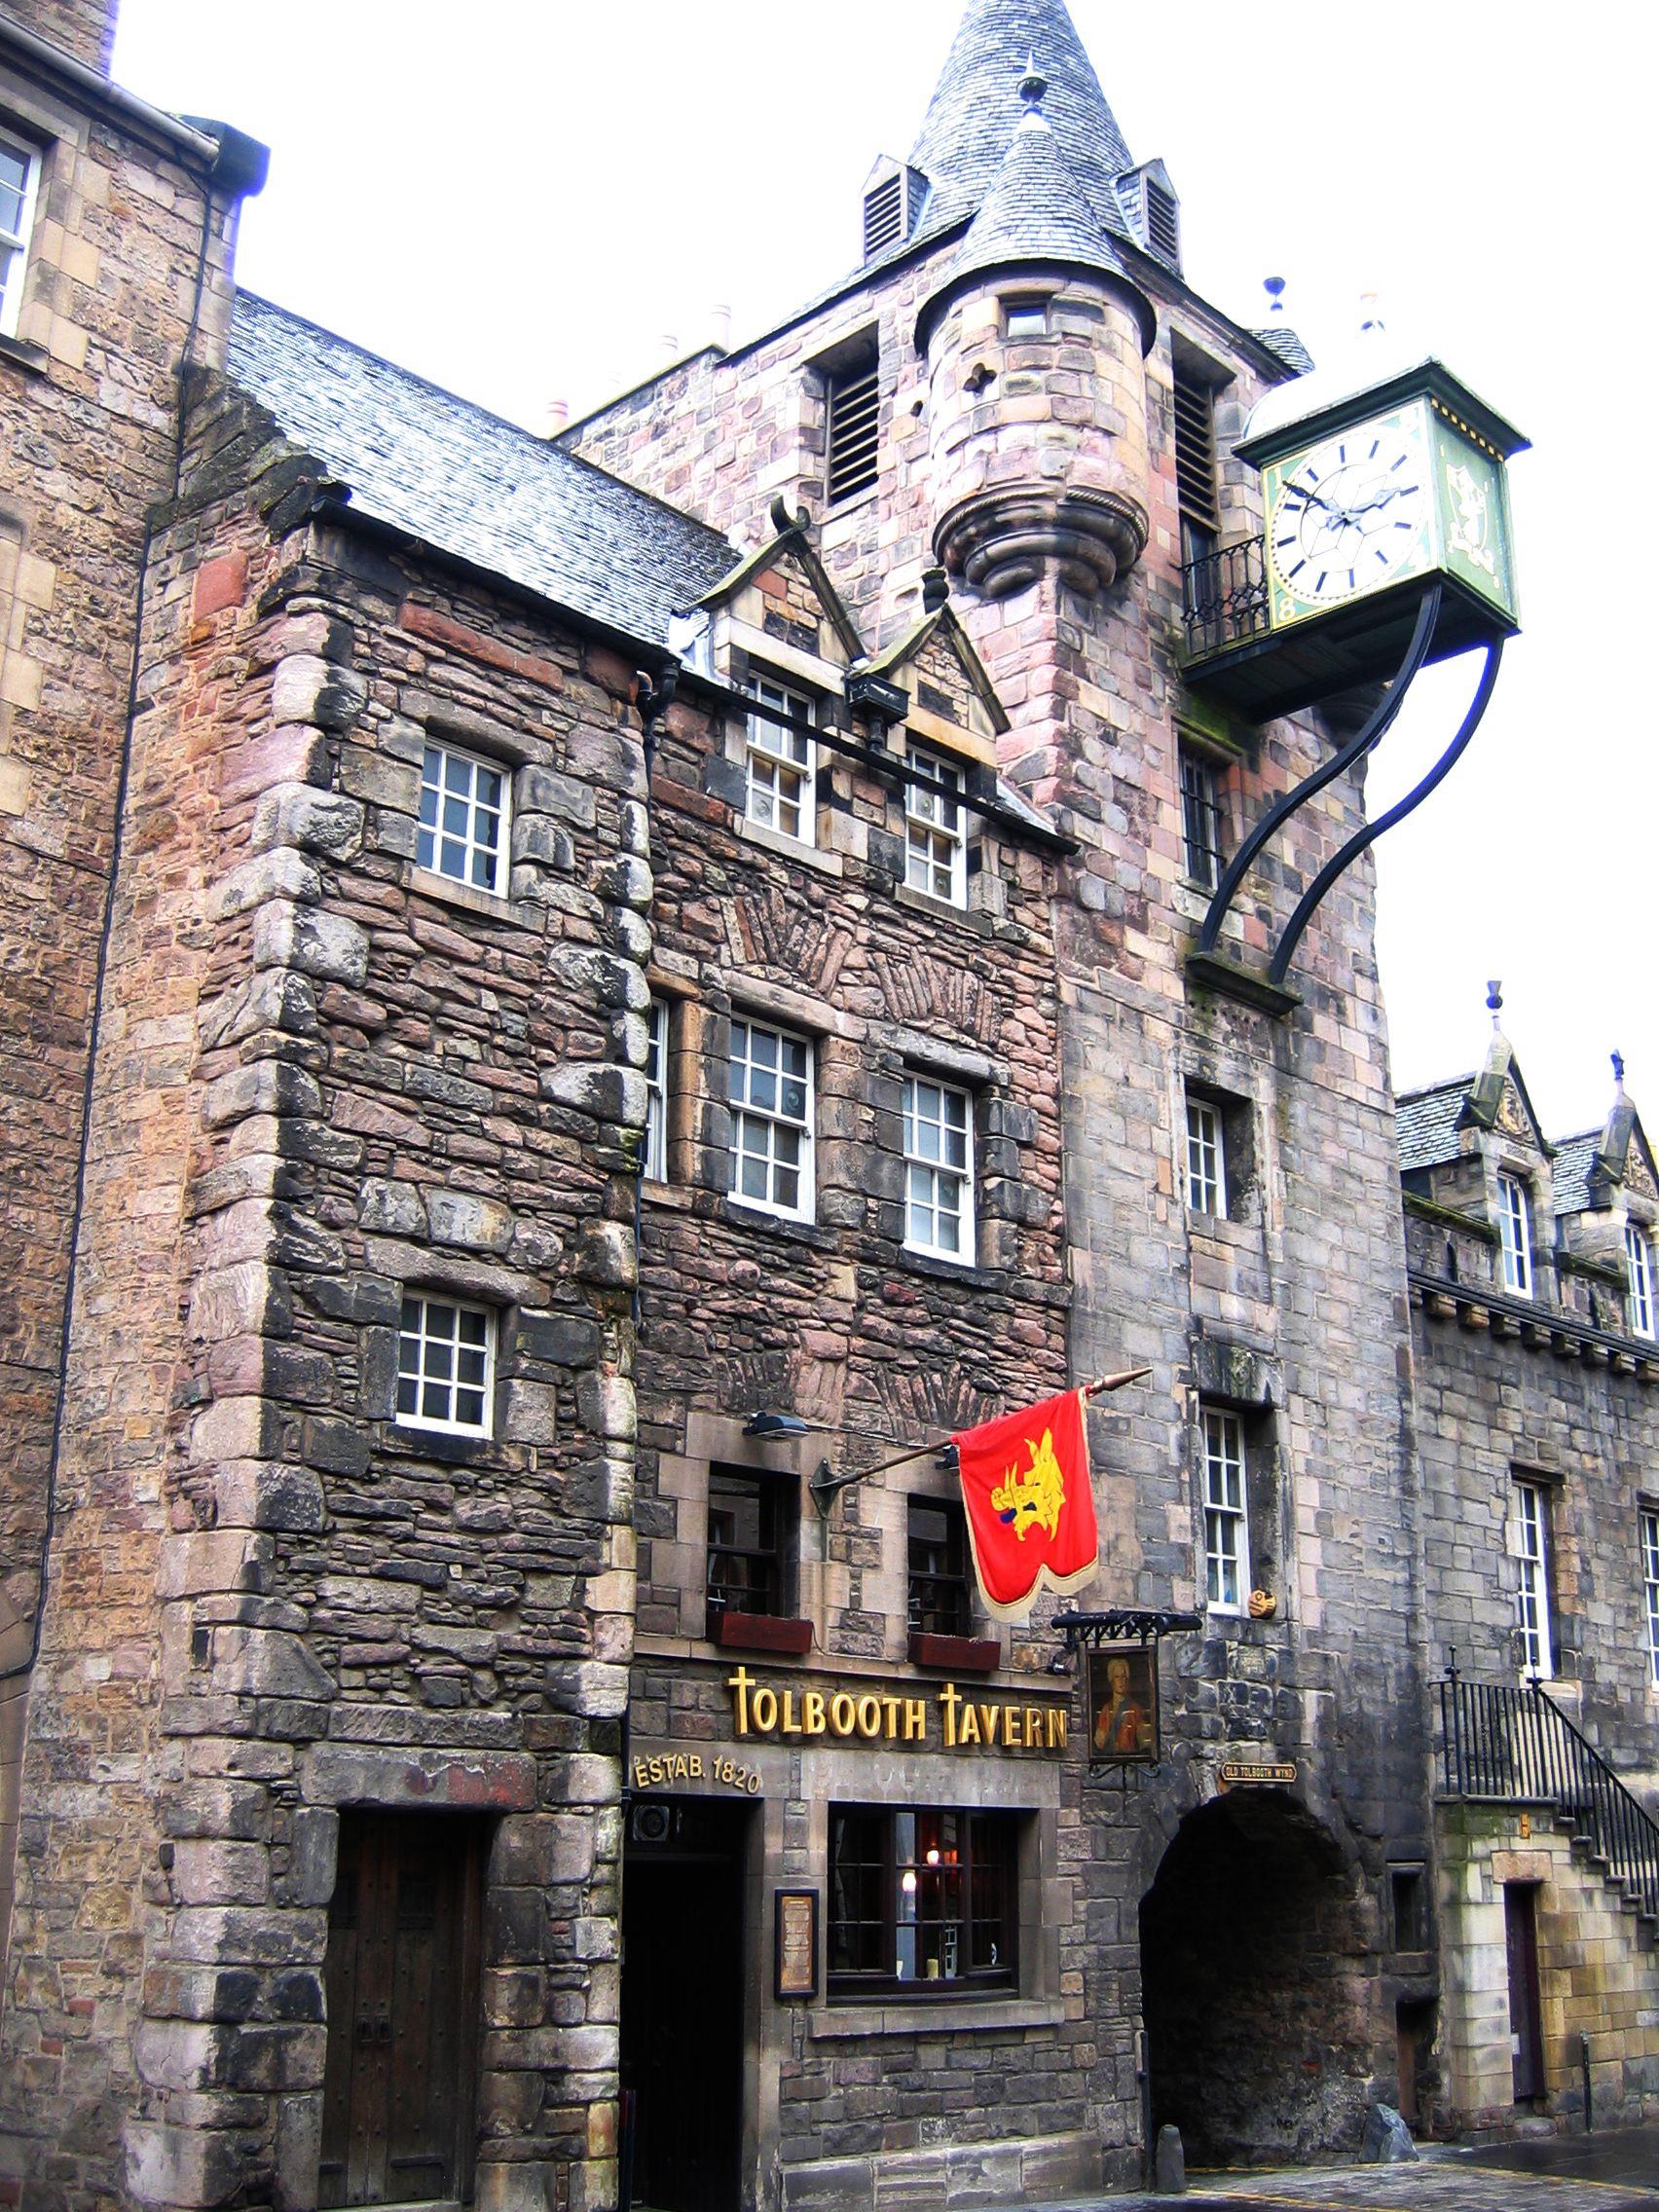 tolbooth tavern on the royal mile edinburgh scotland scotland rh pinterest es